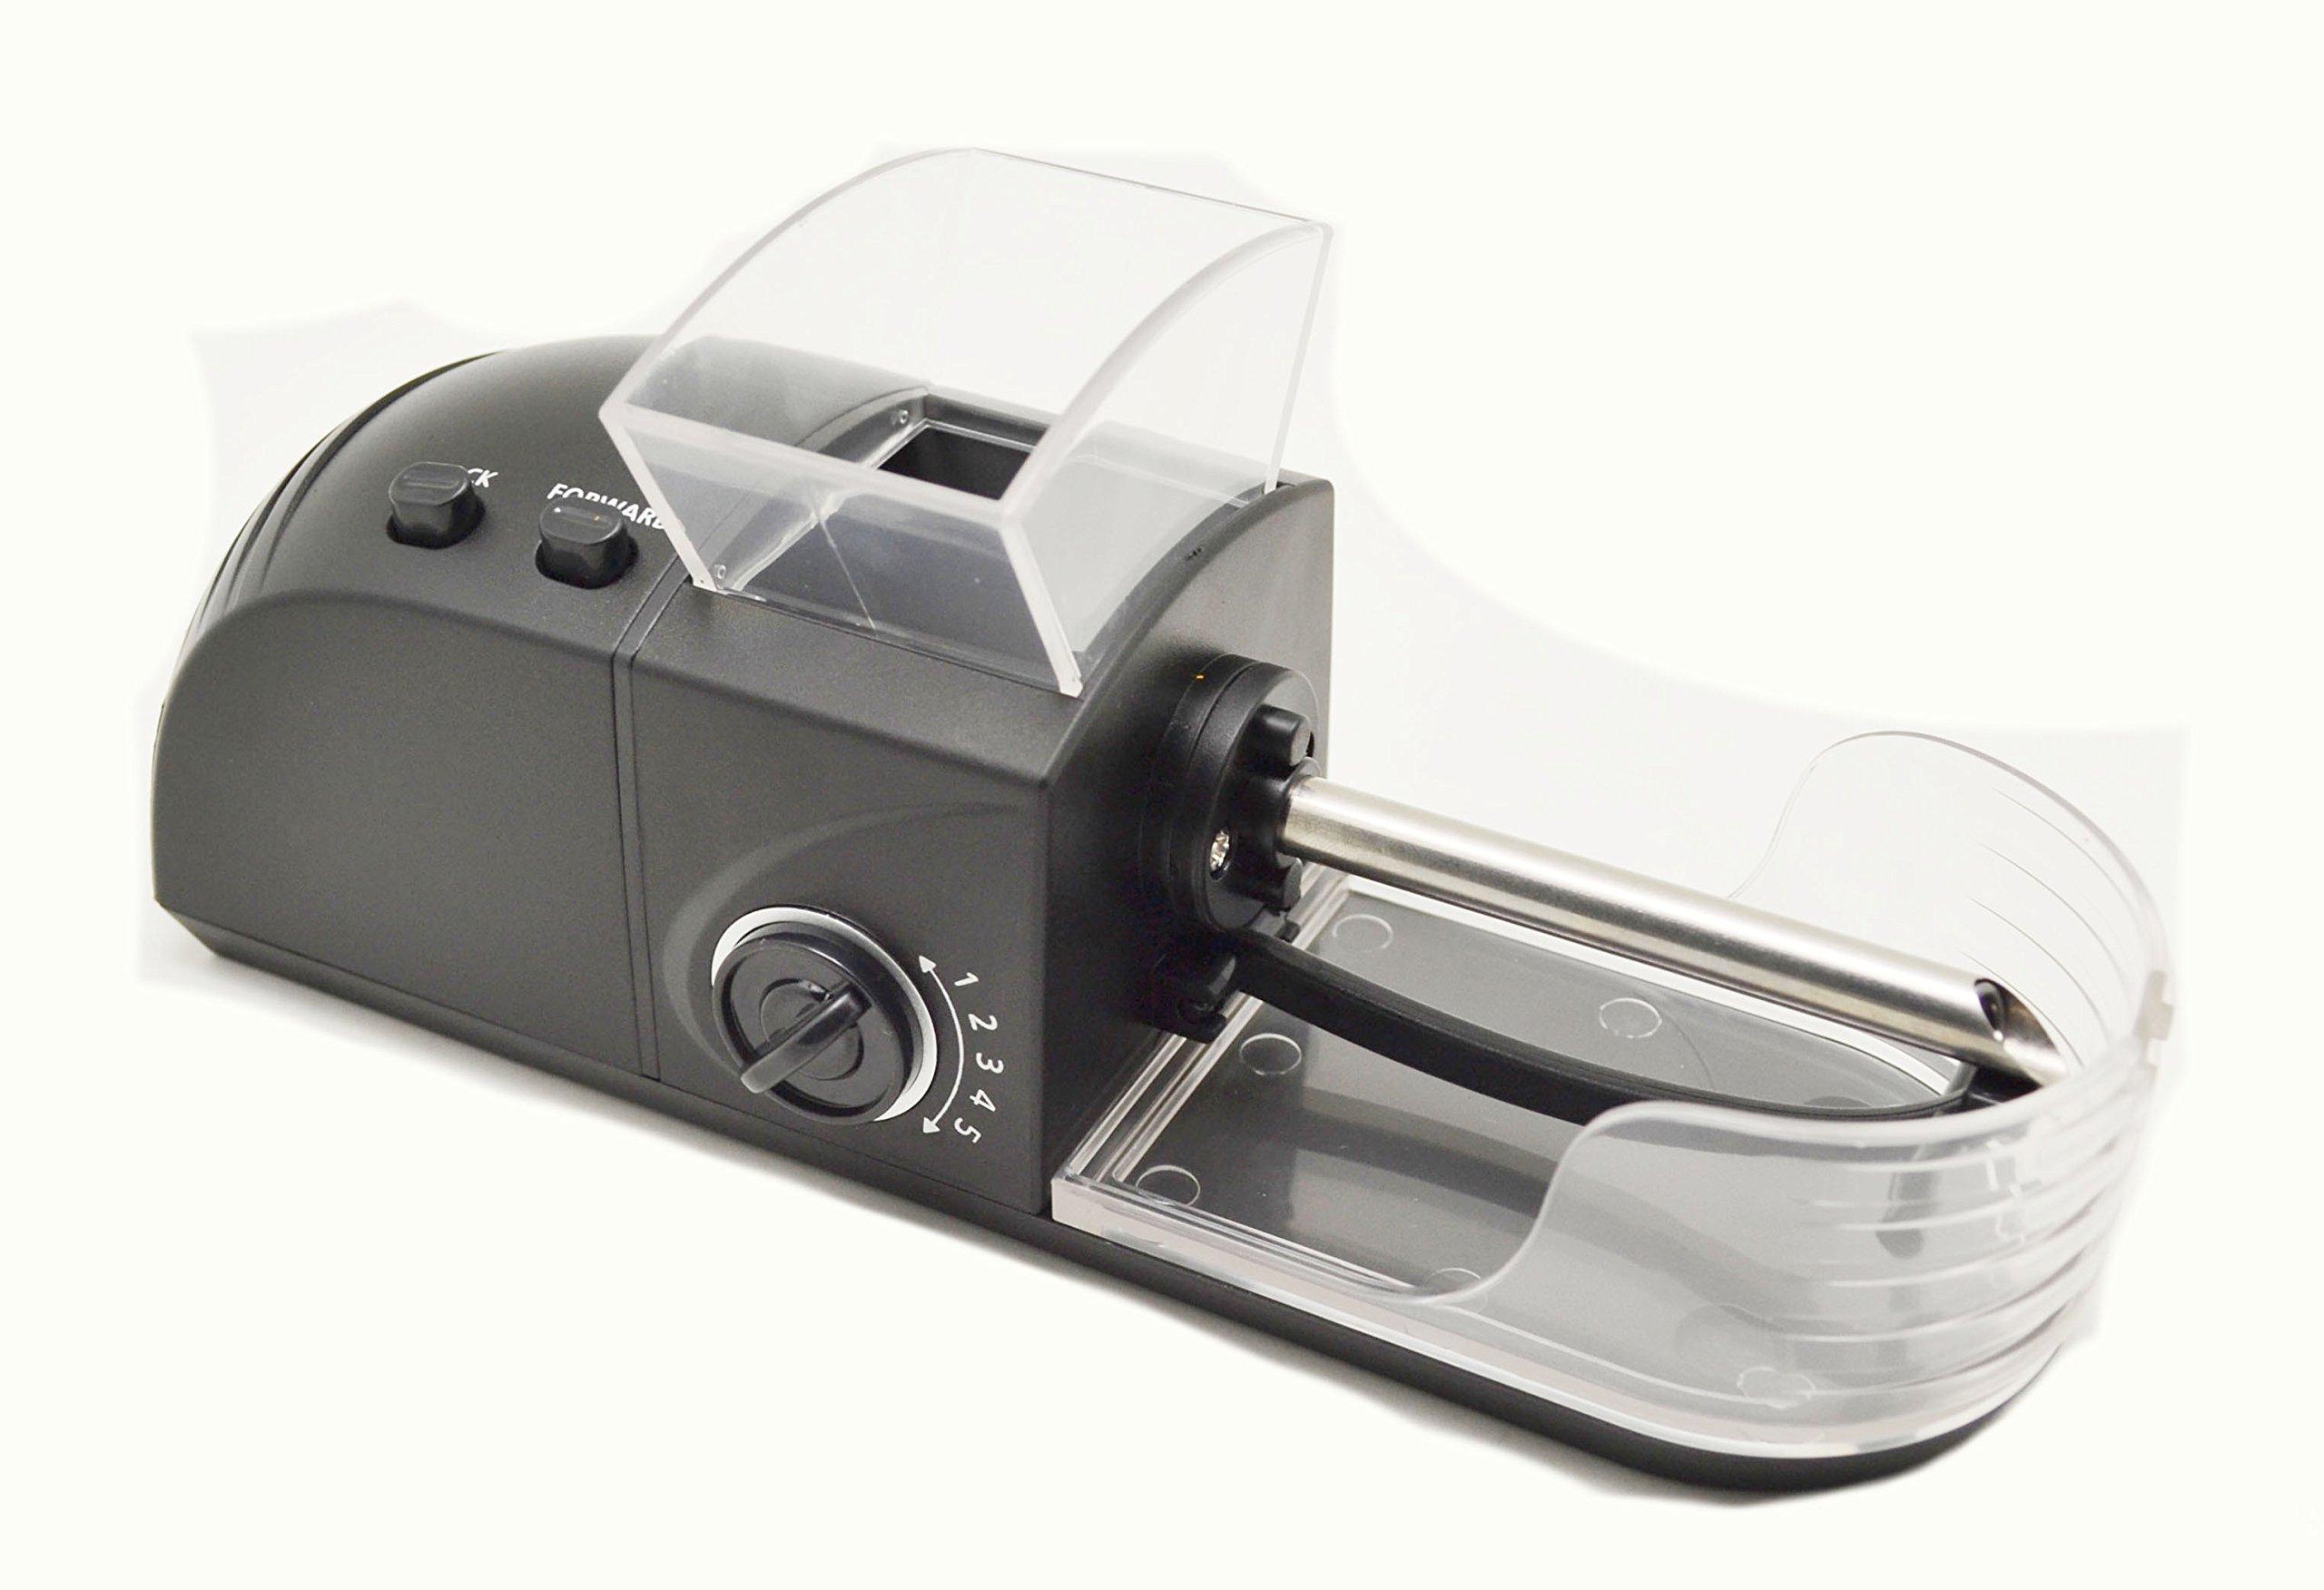 Injector Machines, 6.5 mm Slim Tube auto Cigarette Machine, Cigarette Maker, with Clear Hopper, C-84AS (Black) by EDO